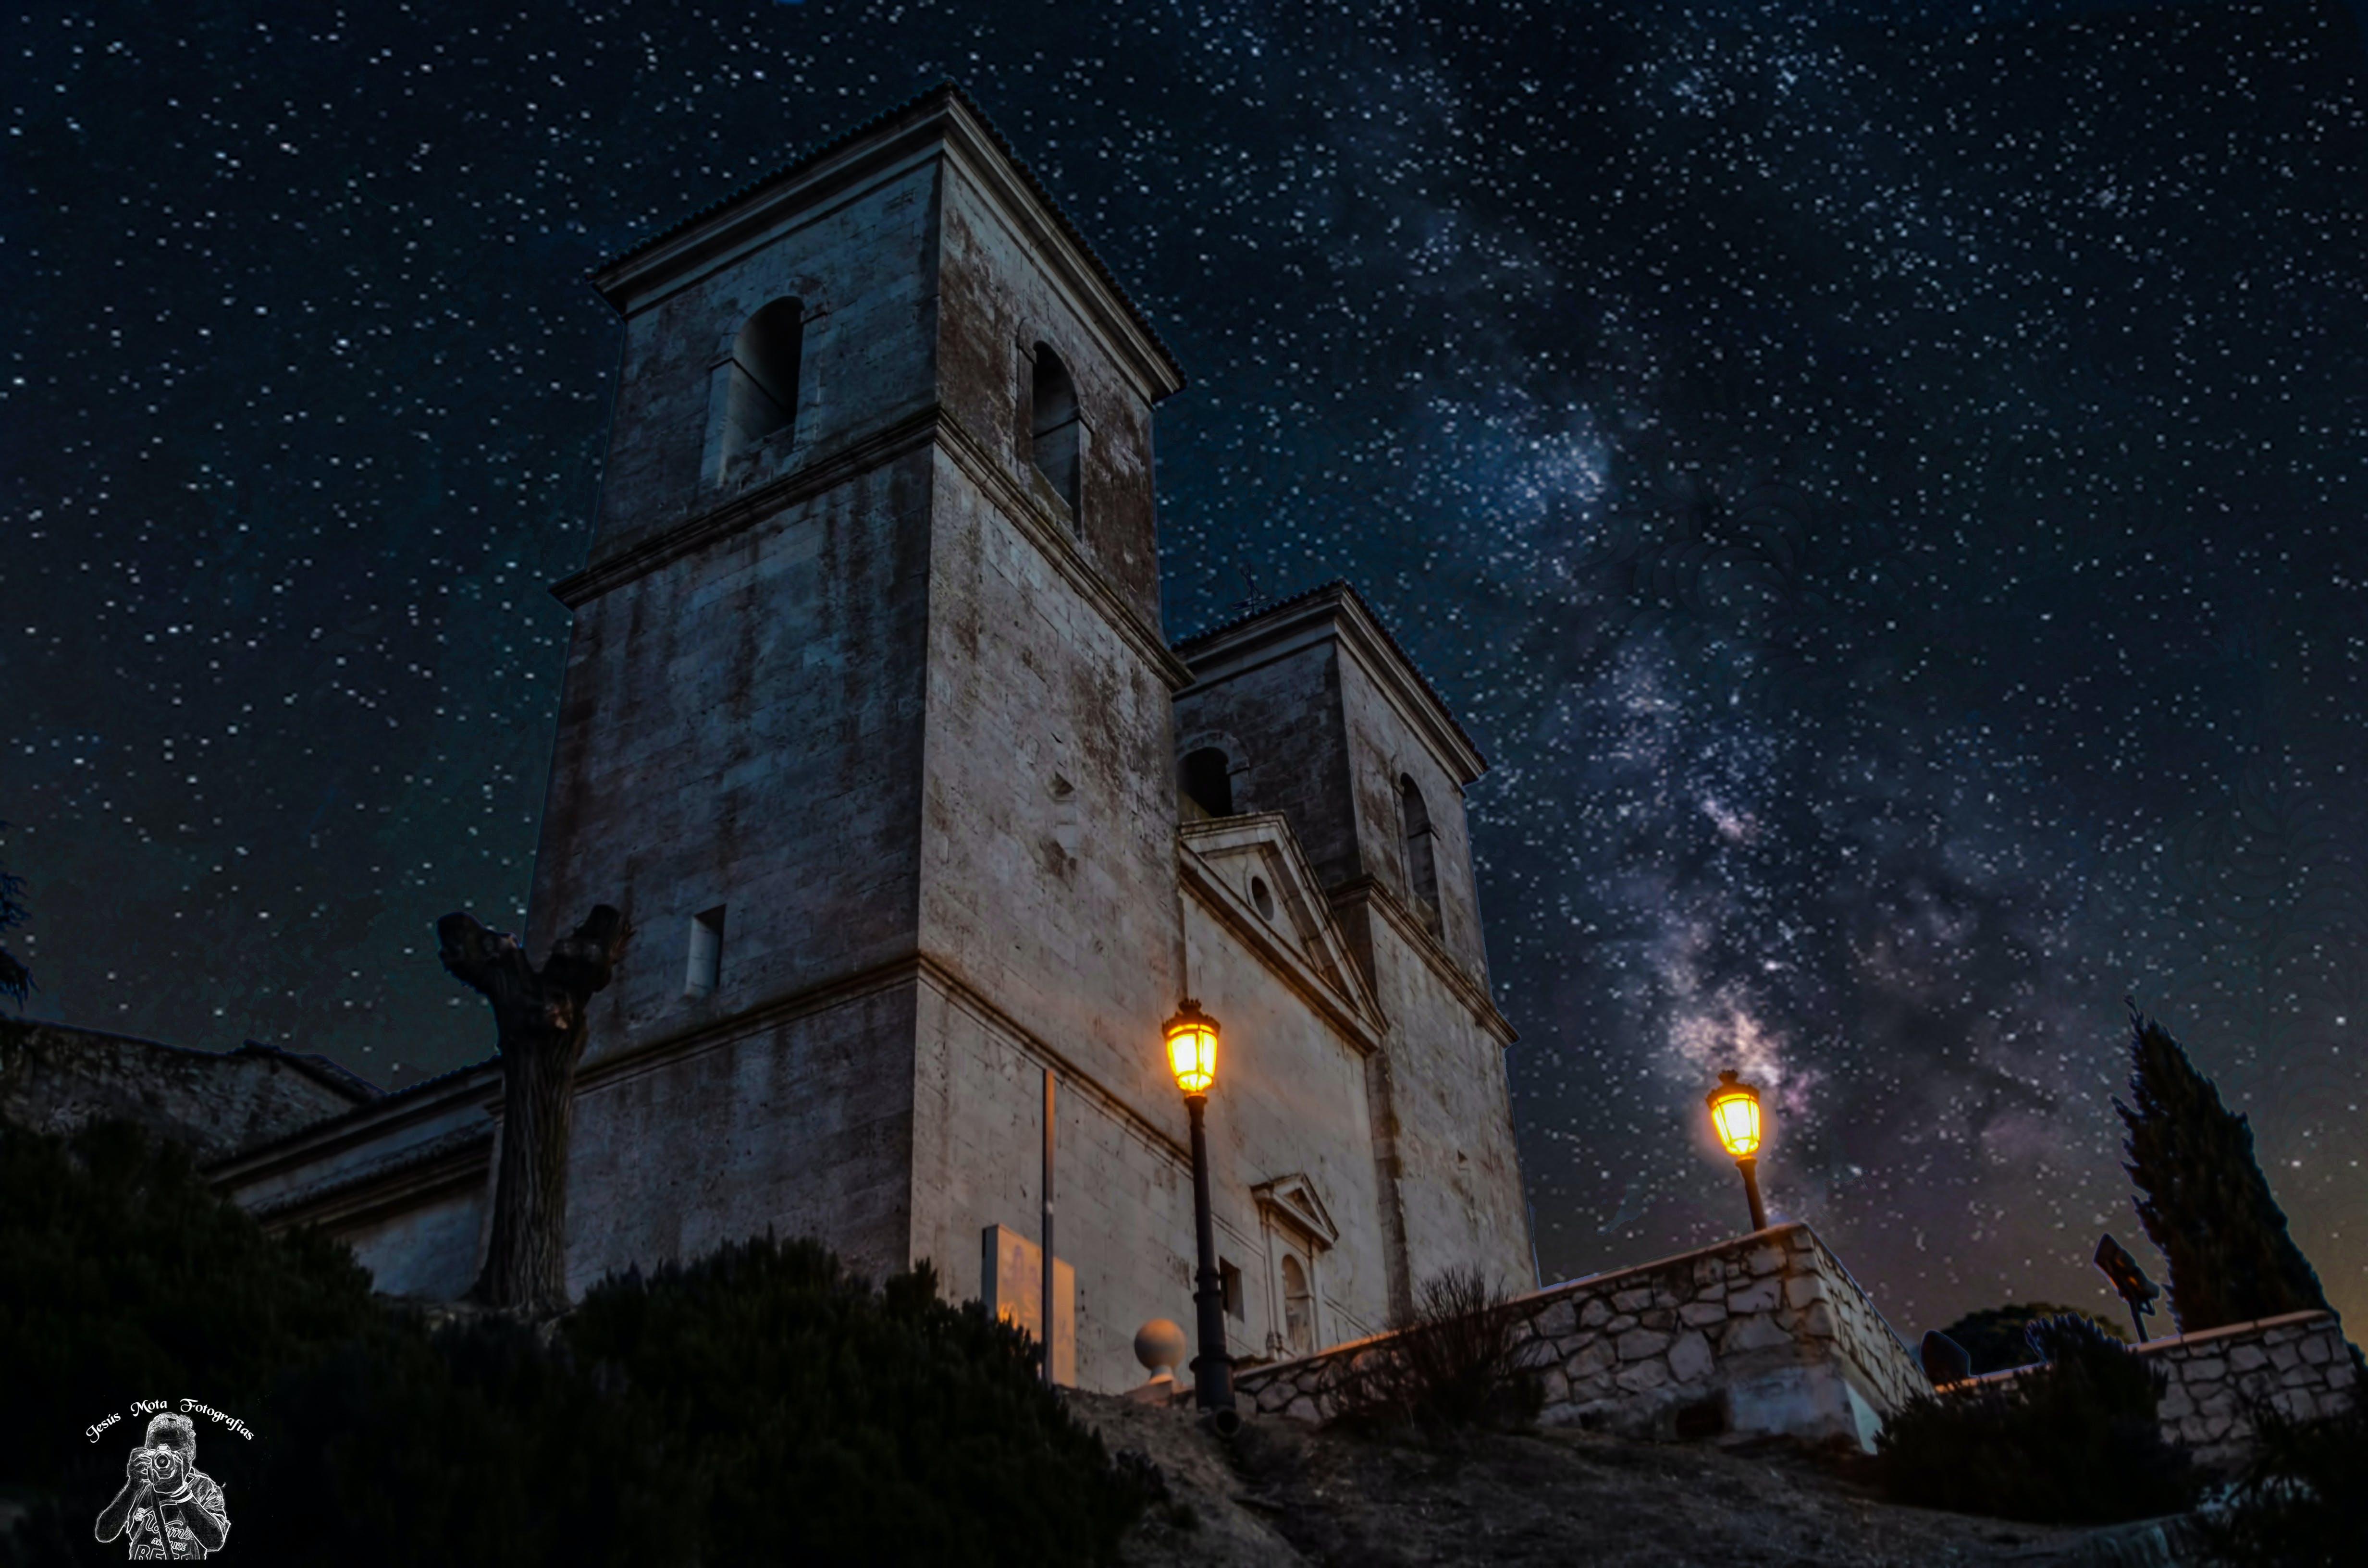 Free stock photo of Iglesia en noche estrellada